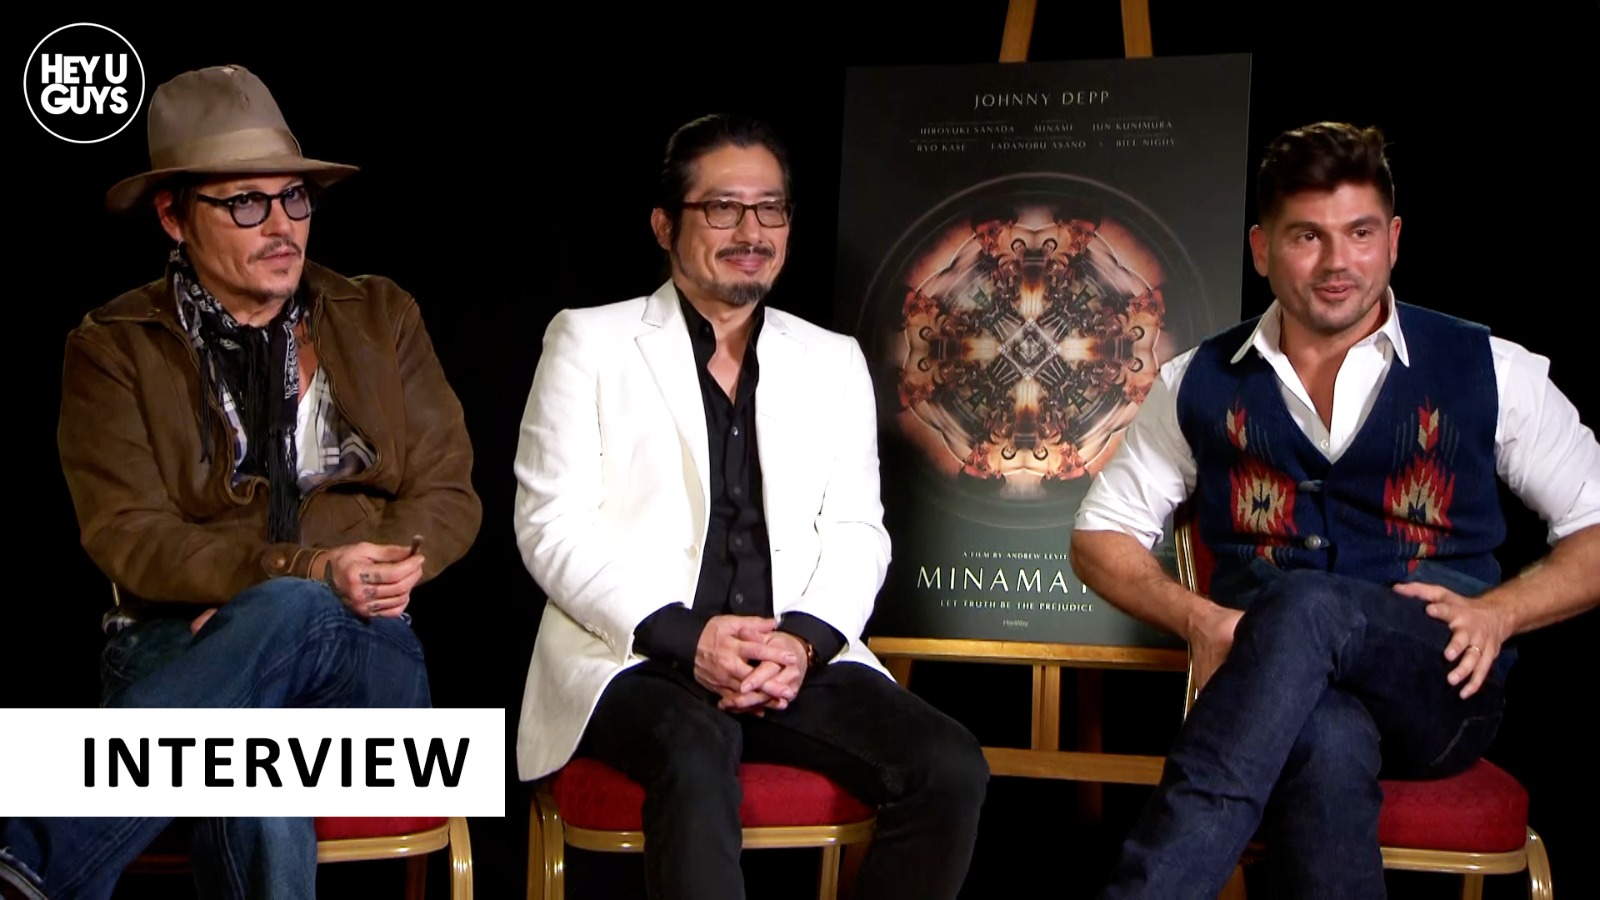 Minamata cast interviews